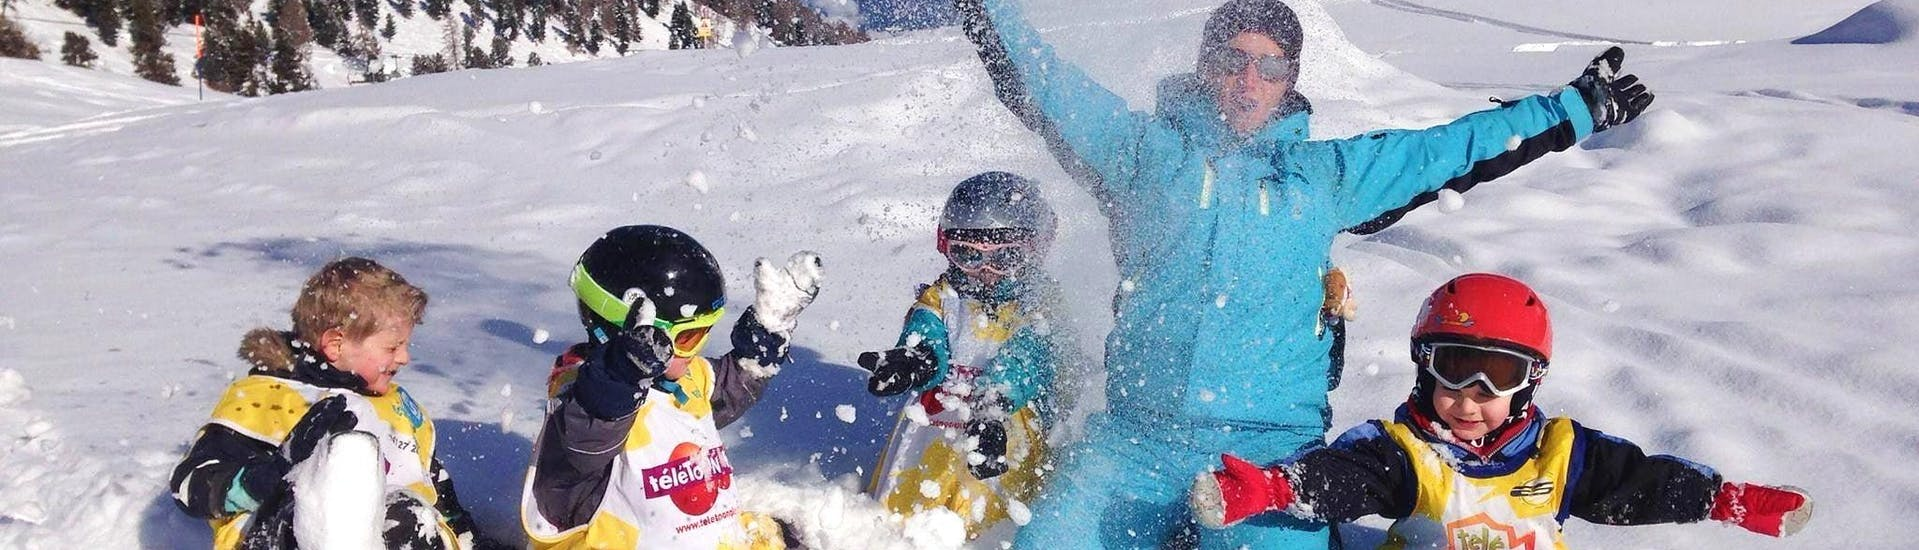 kids-ski-lessons-2-4-years-high-season-esi-arc-en-ciel-siviez-hero